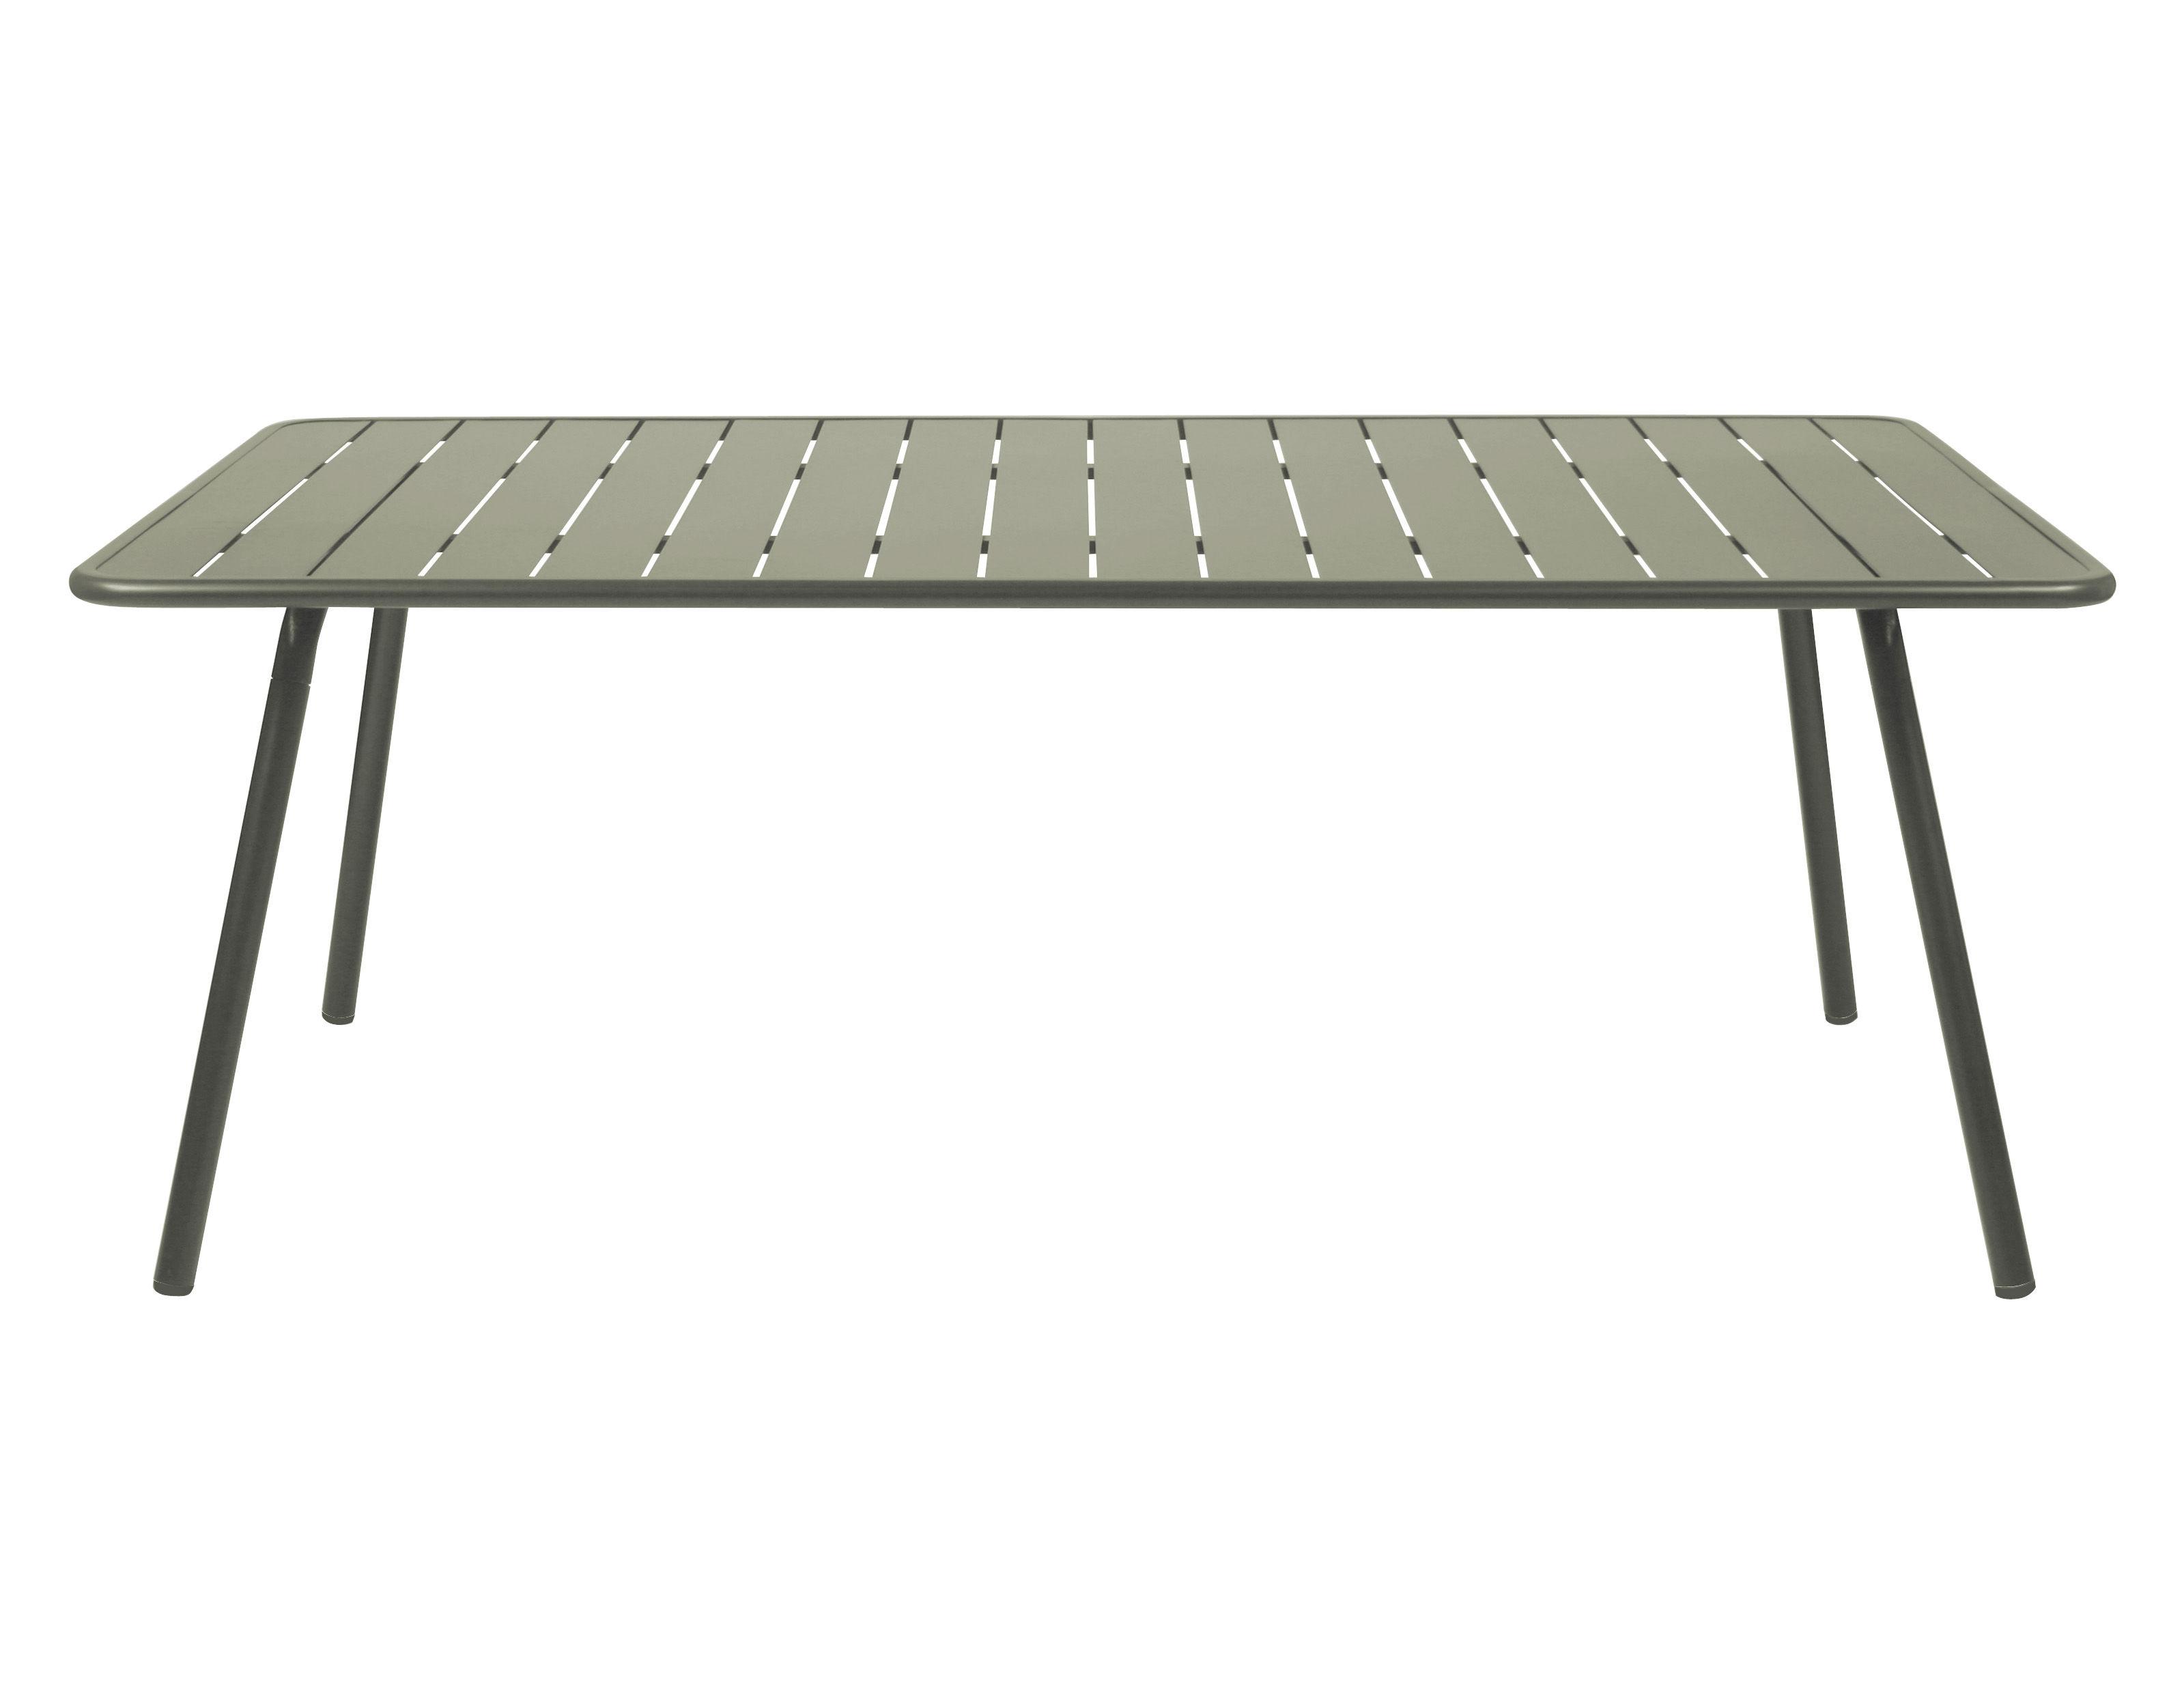 table luxembourg 8 personnes 207 x 100 cm aluminium savane fermob. Black Bedroom Furniture Sets. Home Design Ideas